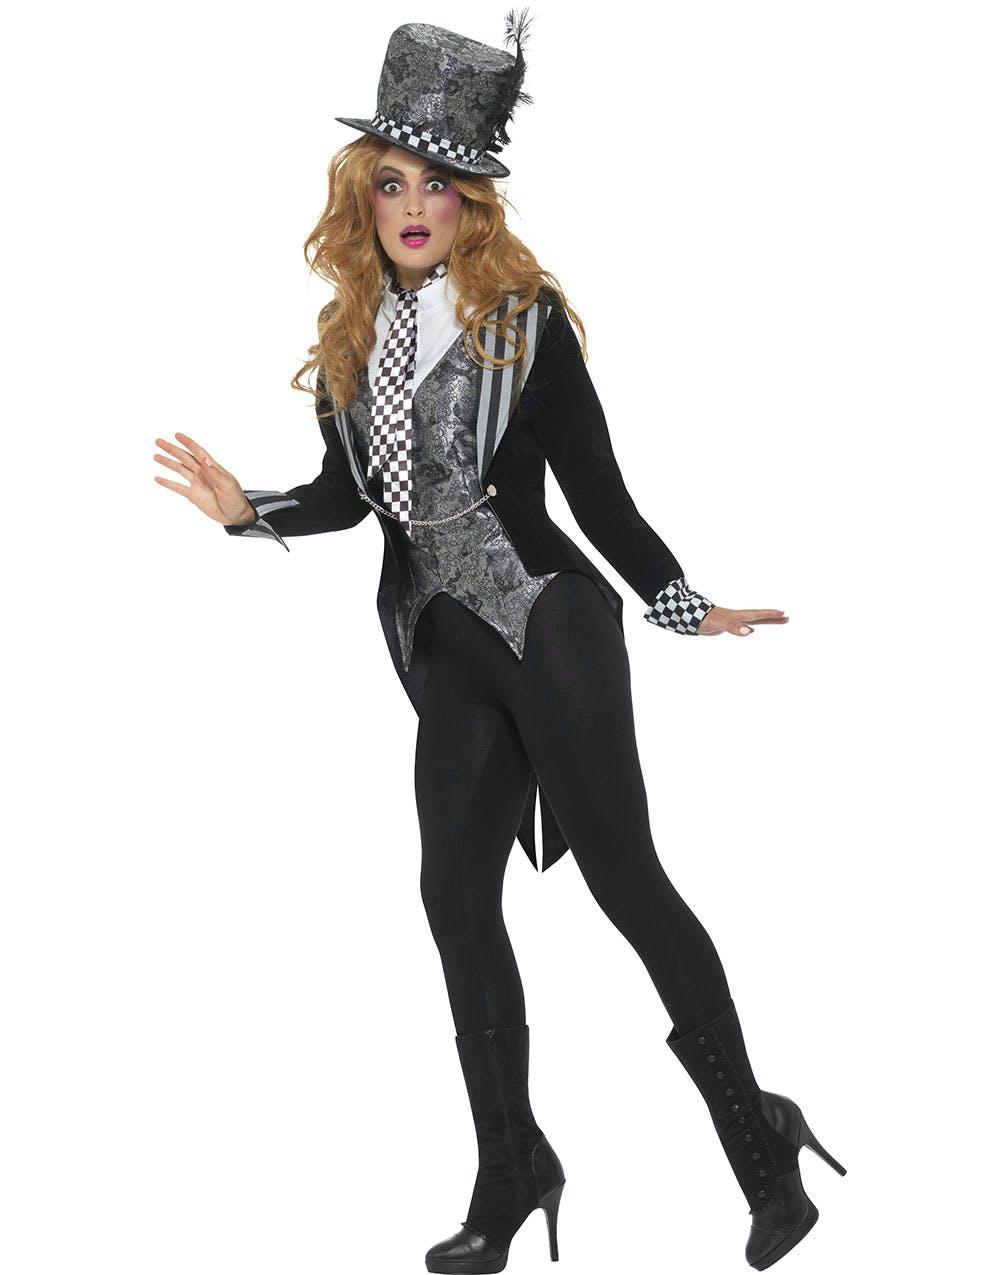 Miss Mad Hatter Inspirerad 4 Delars Kostym 71cbb5e92c3a1